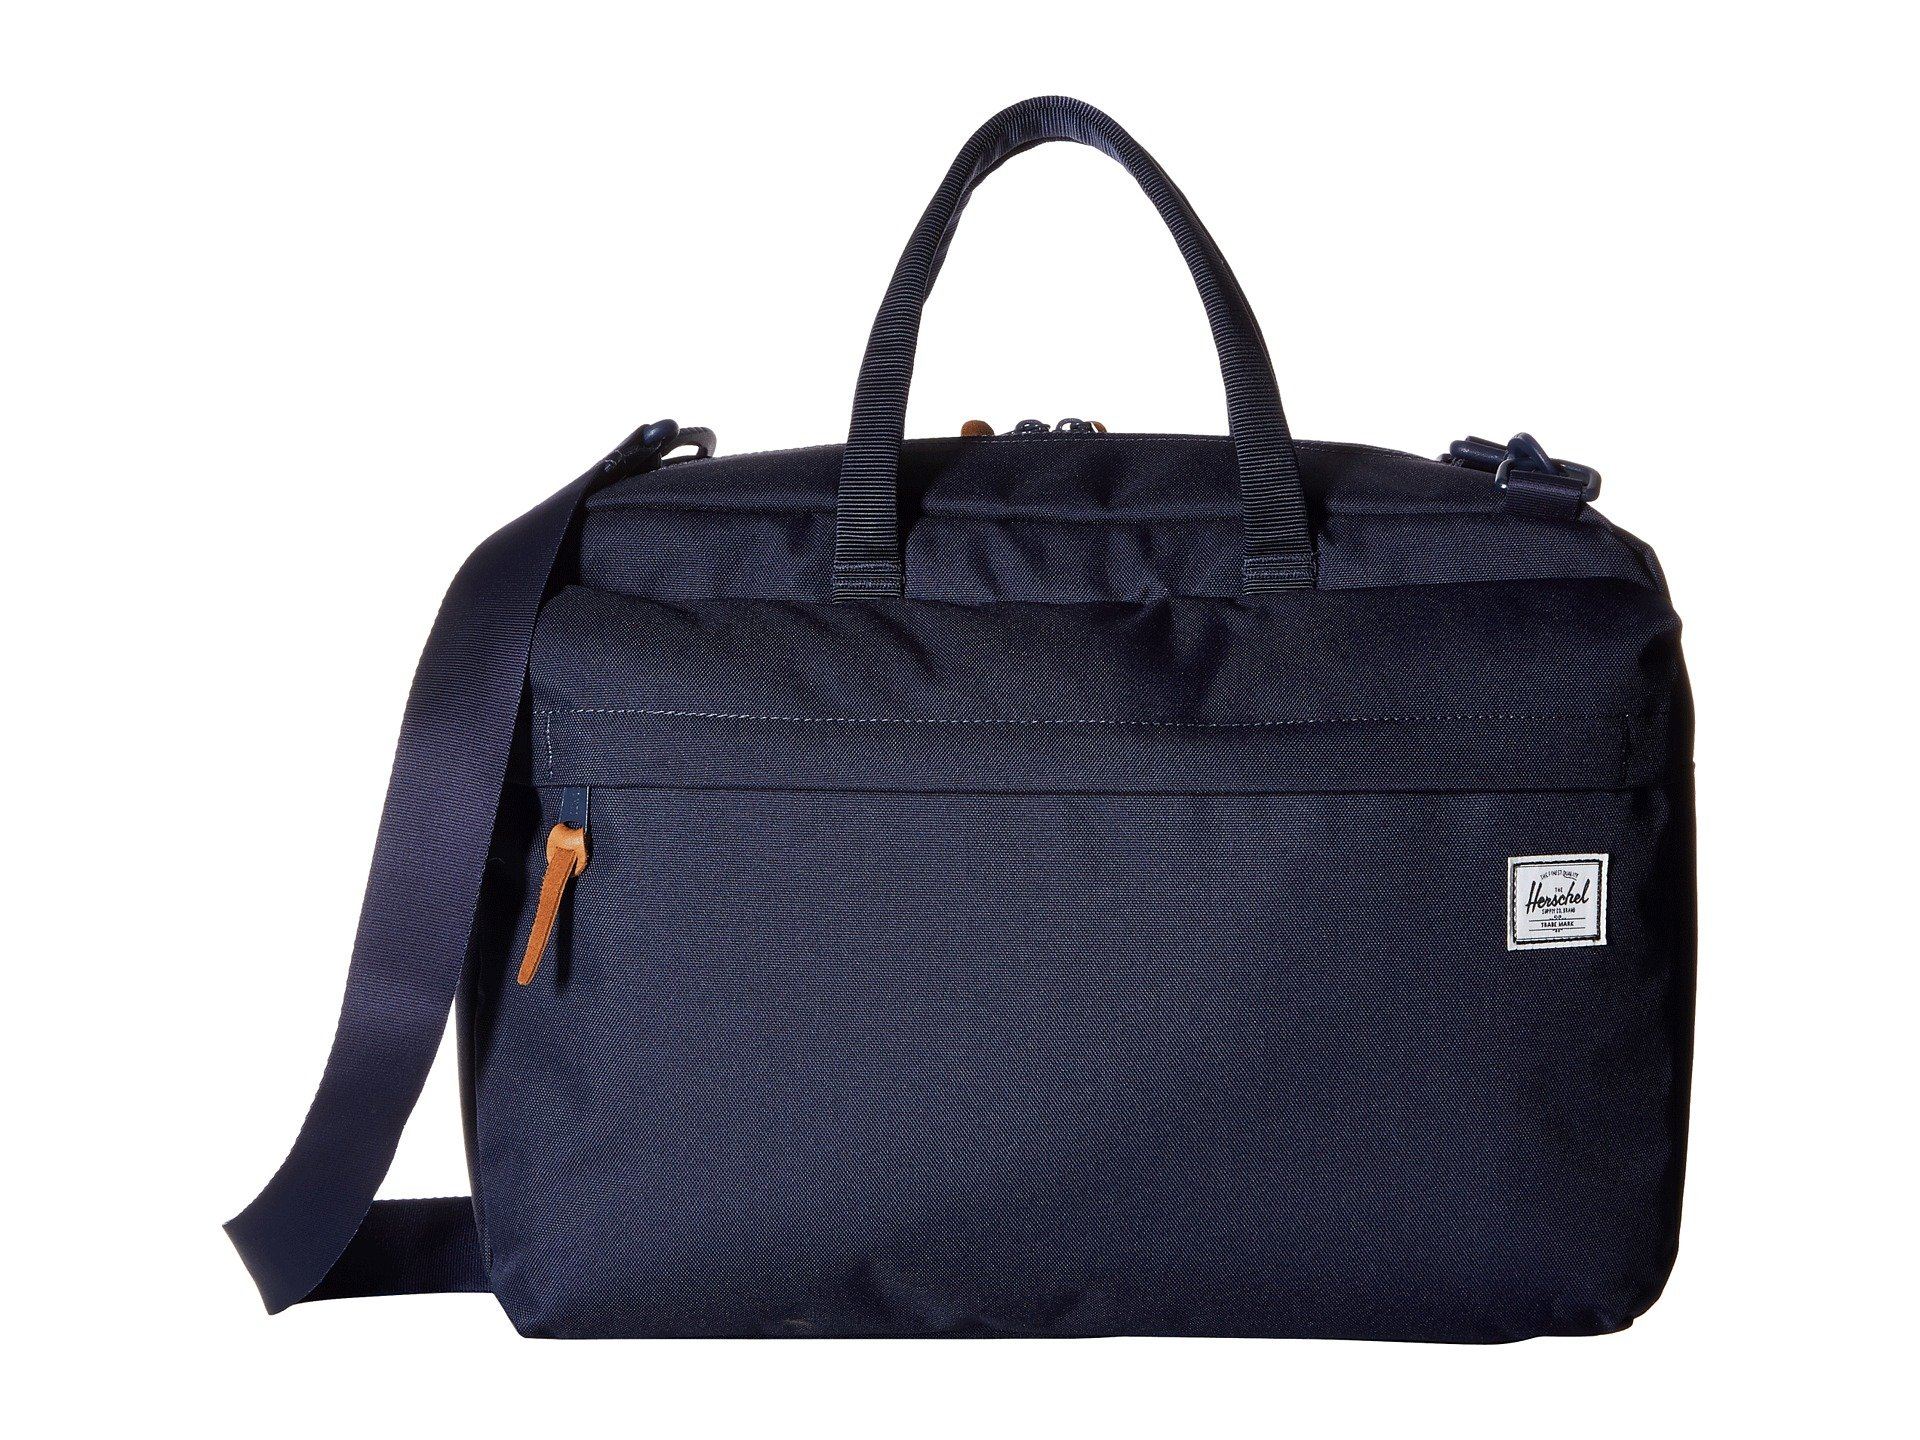 Herschel Supply Co. Sandford Laptop Messenger Bag, Peacoat, One Size